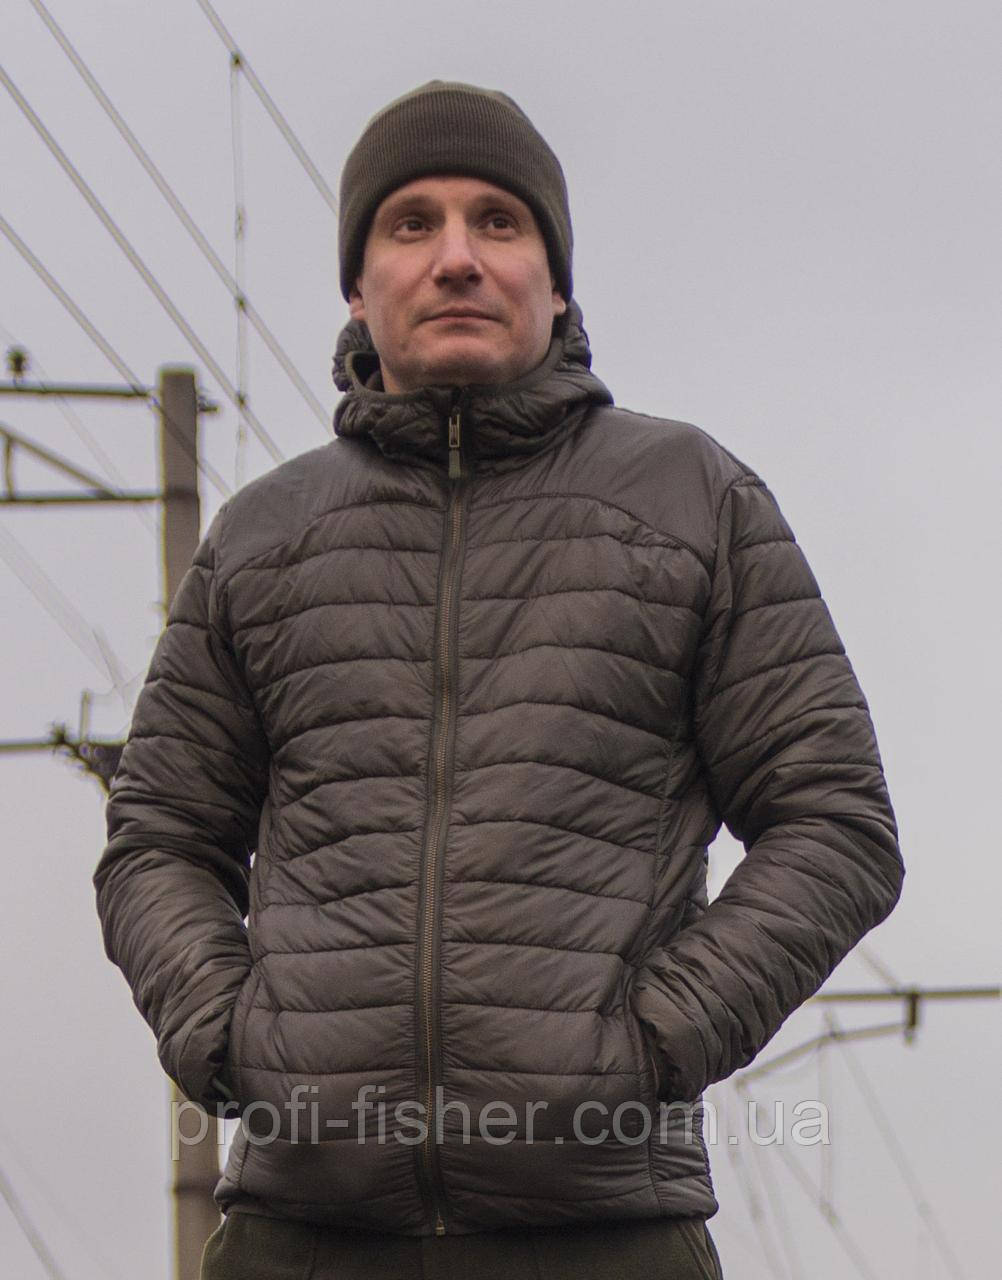 Куртка KLOST G-Loft 5023 3XL Khaki